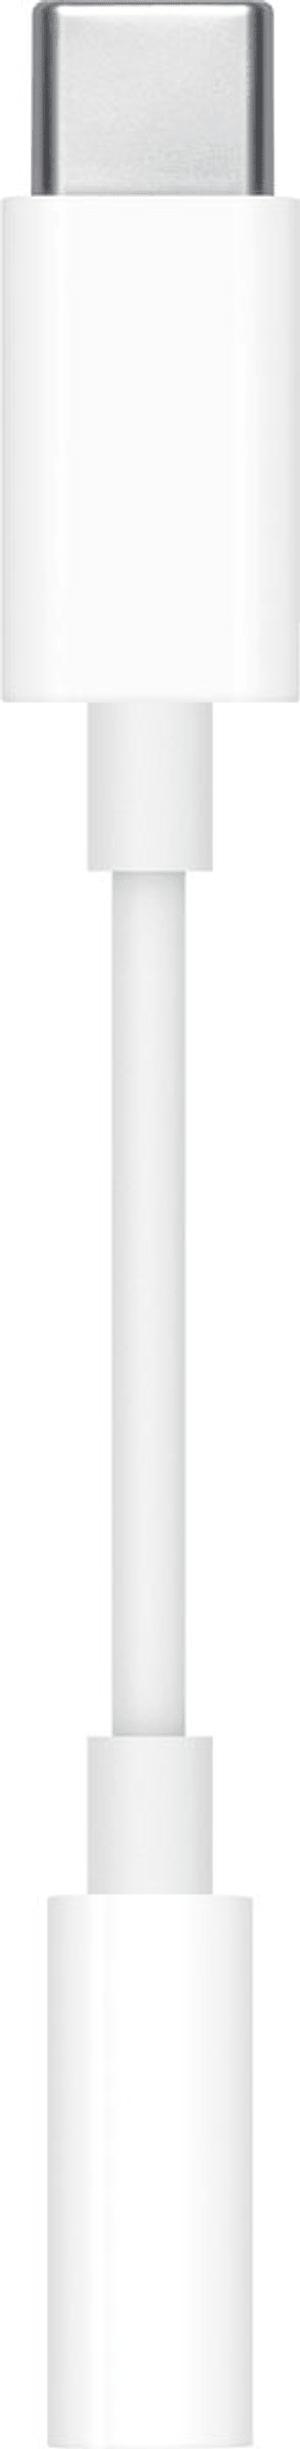 Adattatore USB-C to 3.5 mm Headphone Jack